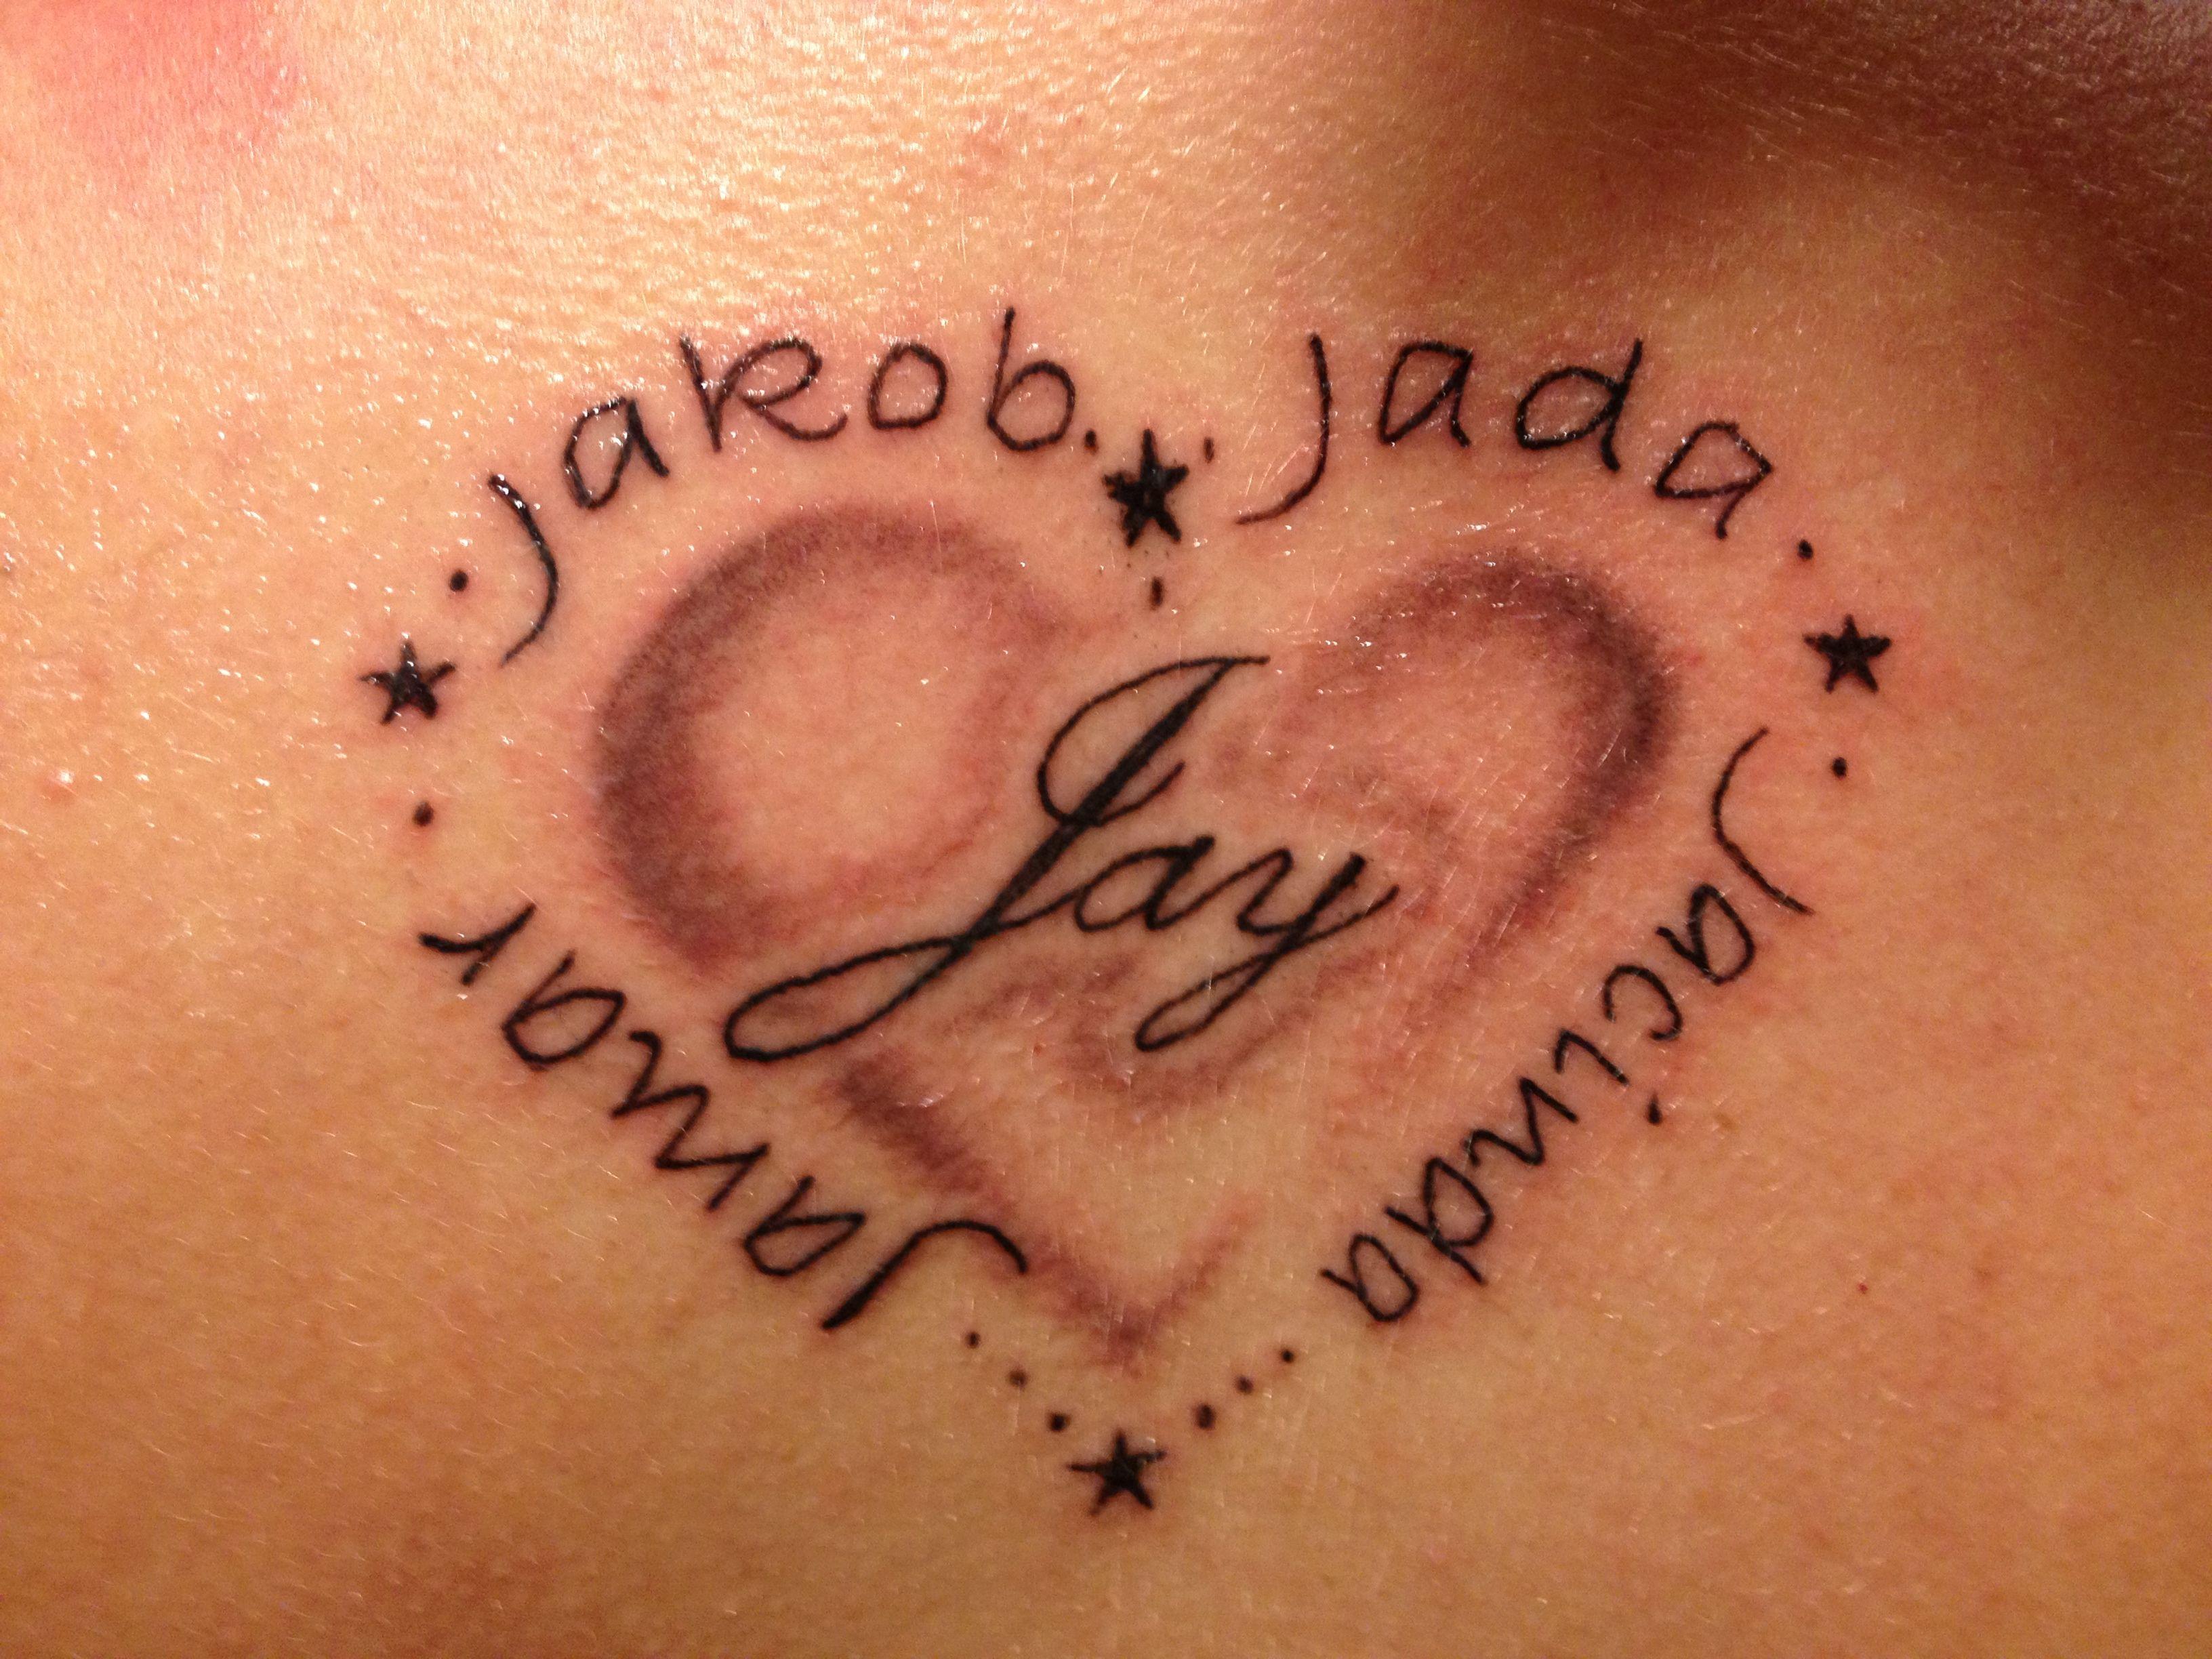 My family tattoo skin art pinterest for My family tattoo